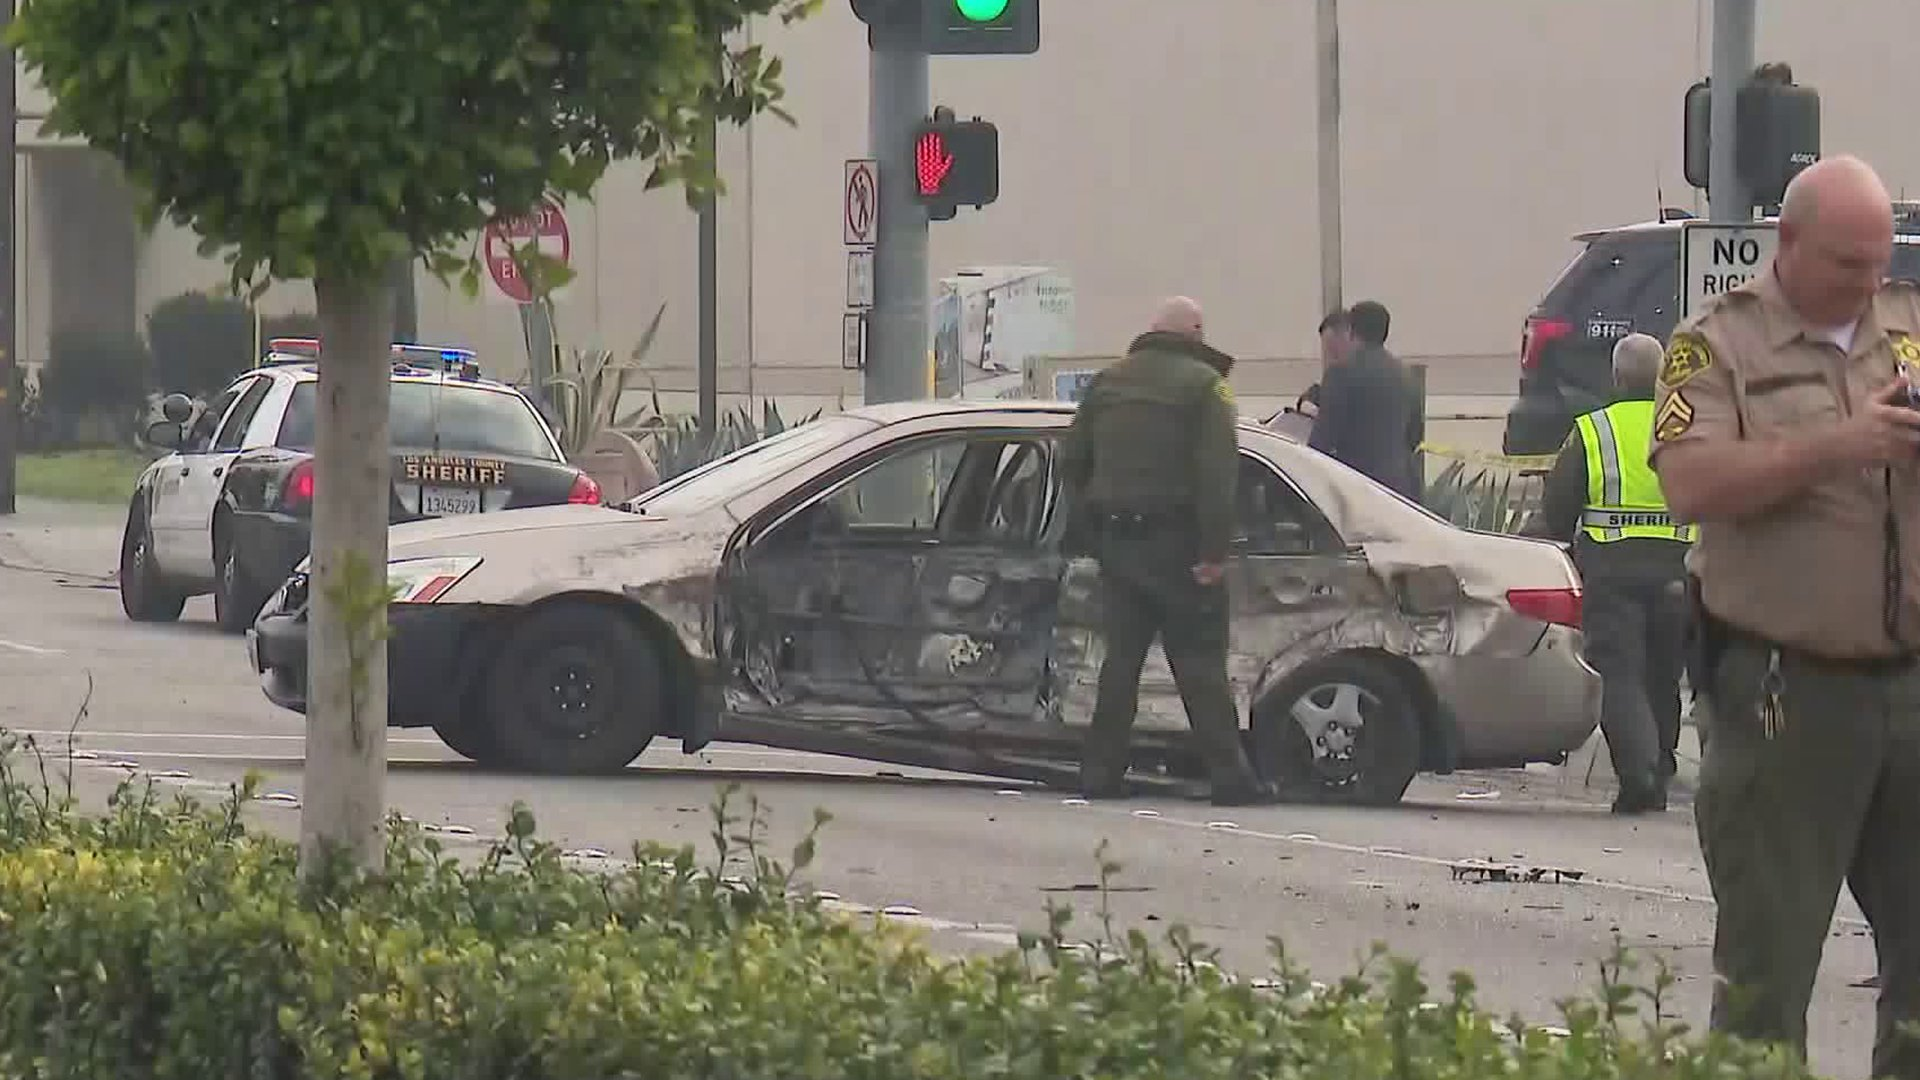 Two deputies crash into a car in Paramount on Jan. 16, 2020. (Credit: KTLA)